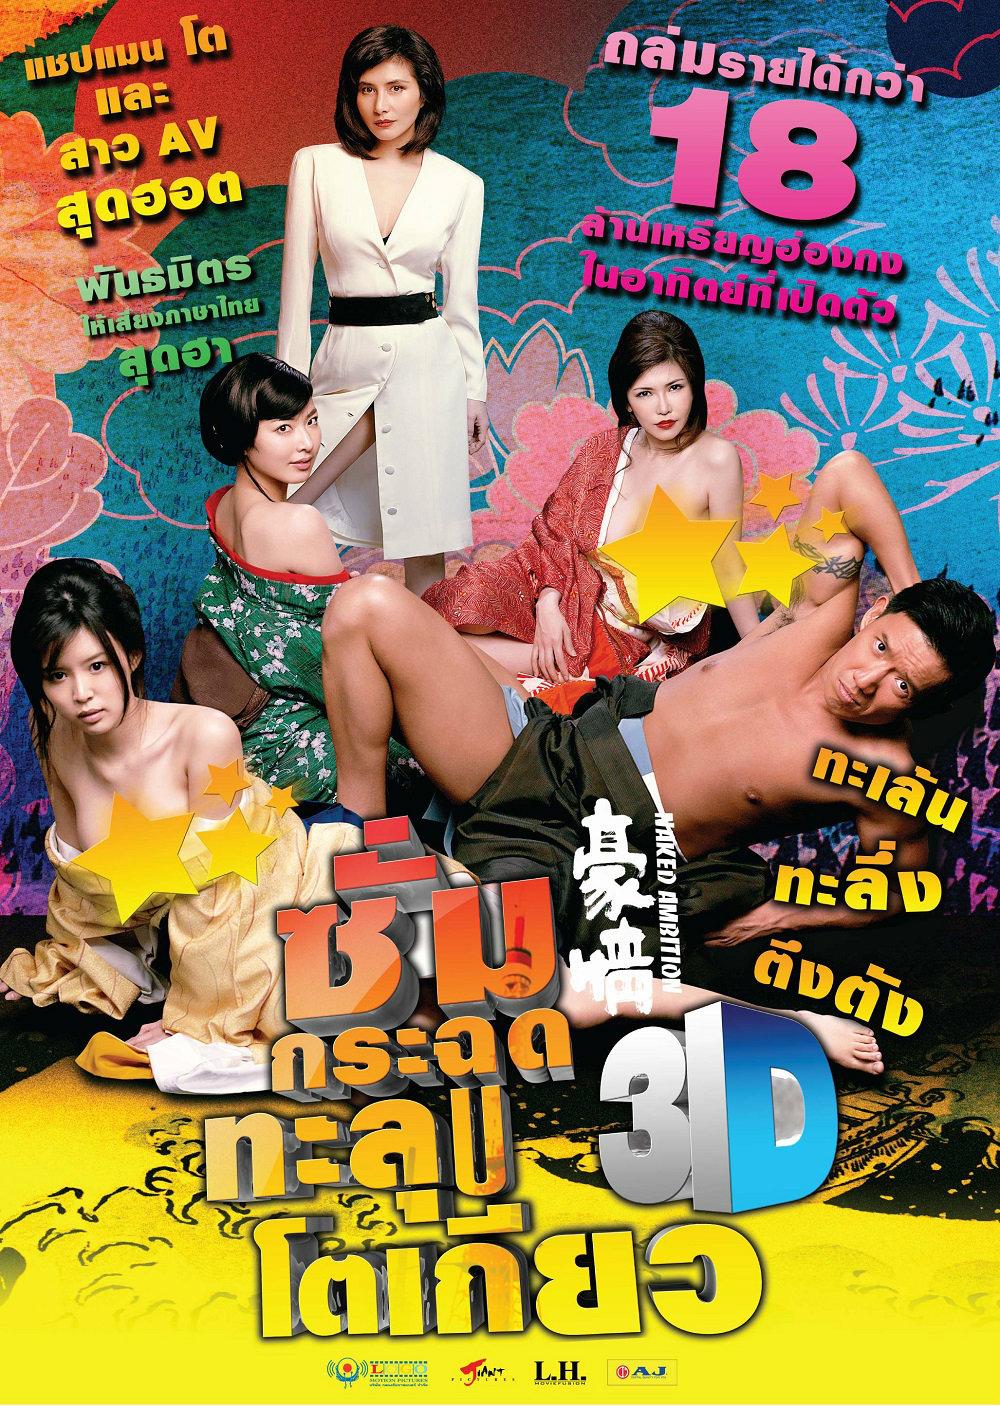 Naked Ambition 3D (2014) ซั่มกระฉูด ทะลุโตเกียว